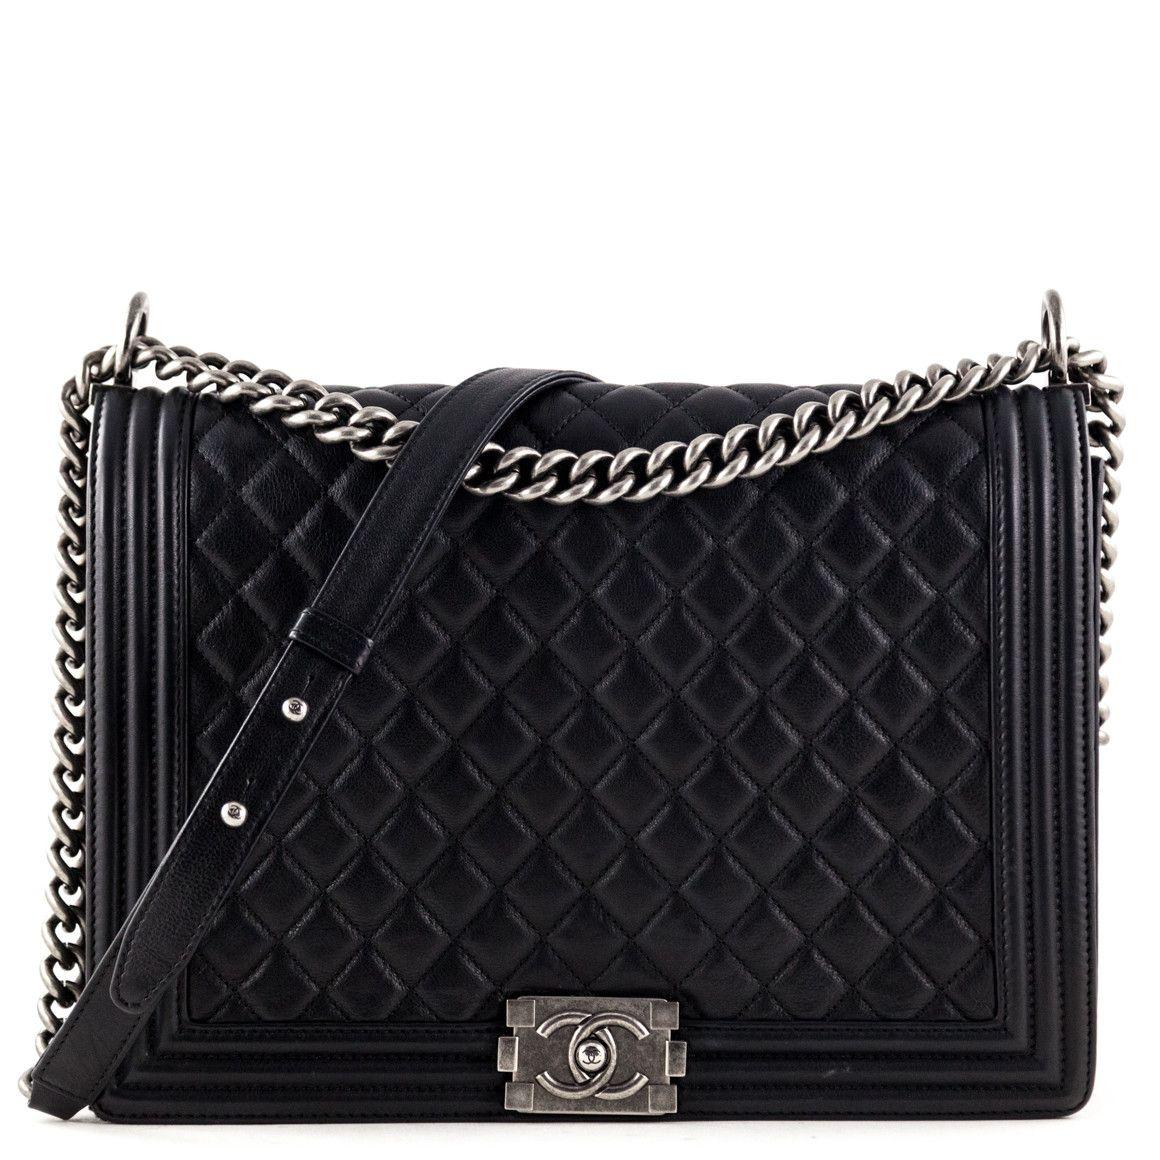 Chanel_Black_Large_Boy_Bag-1.jpg